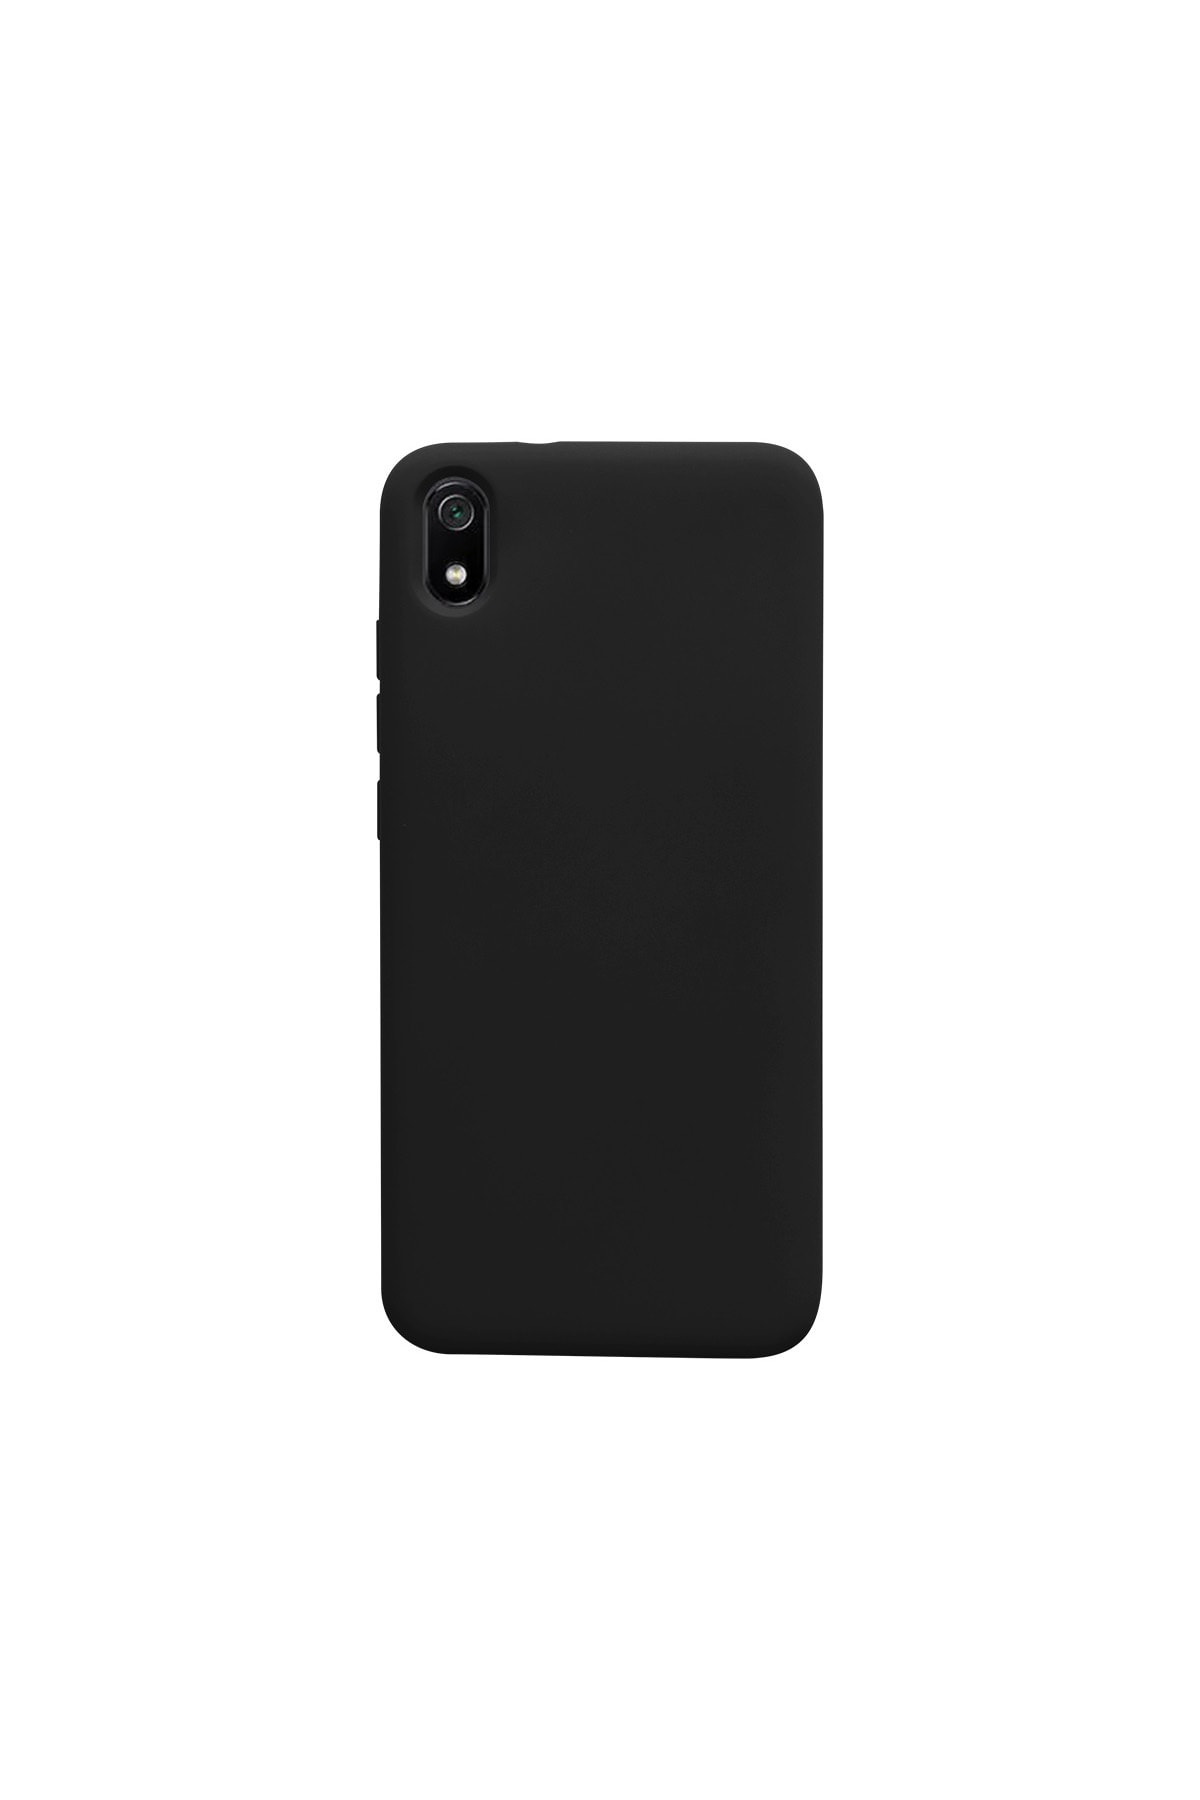 casemarkt Xiaomi Redmi 7a Lansman Siyah Silikon Telefon Kılıfı Mikro Fiber Iç Yüzey 1